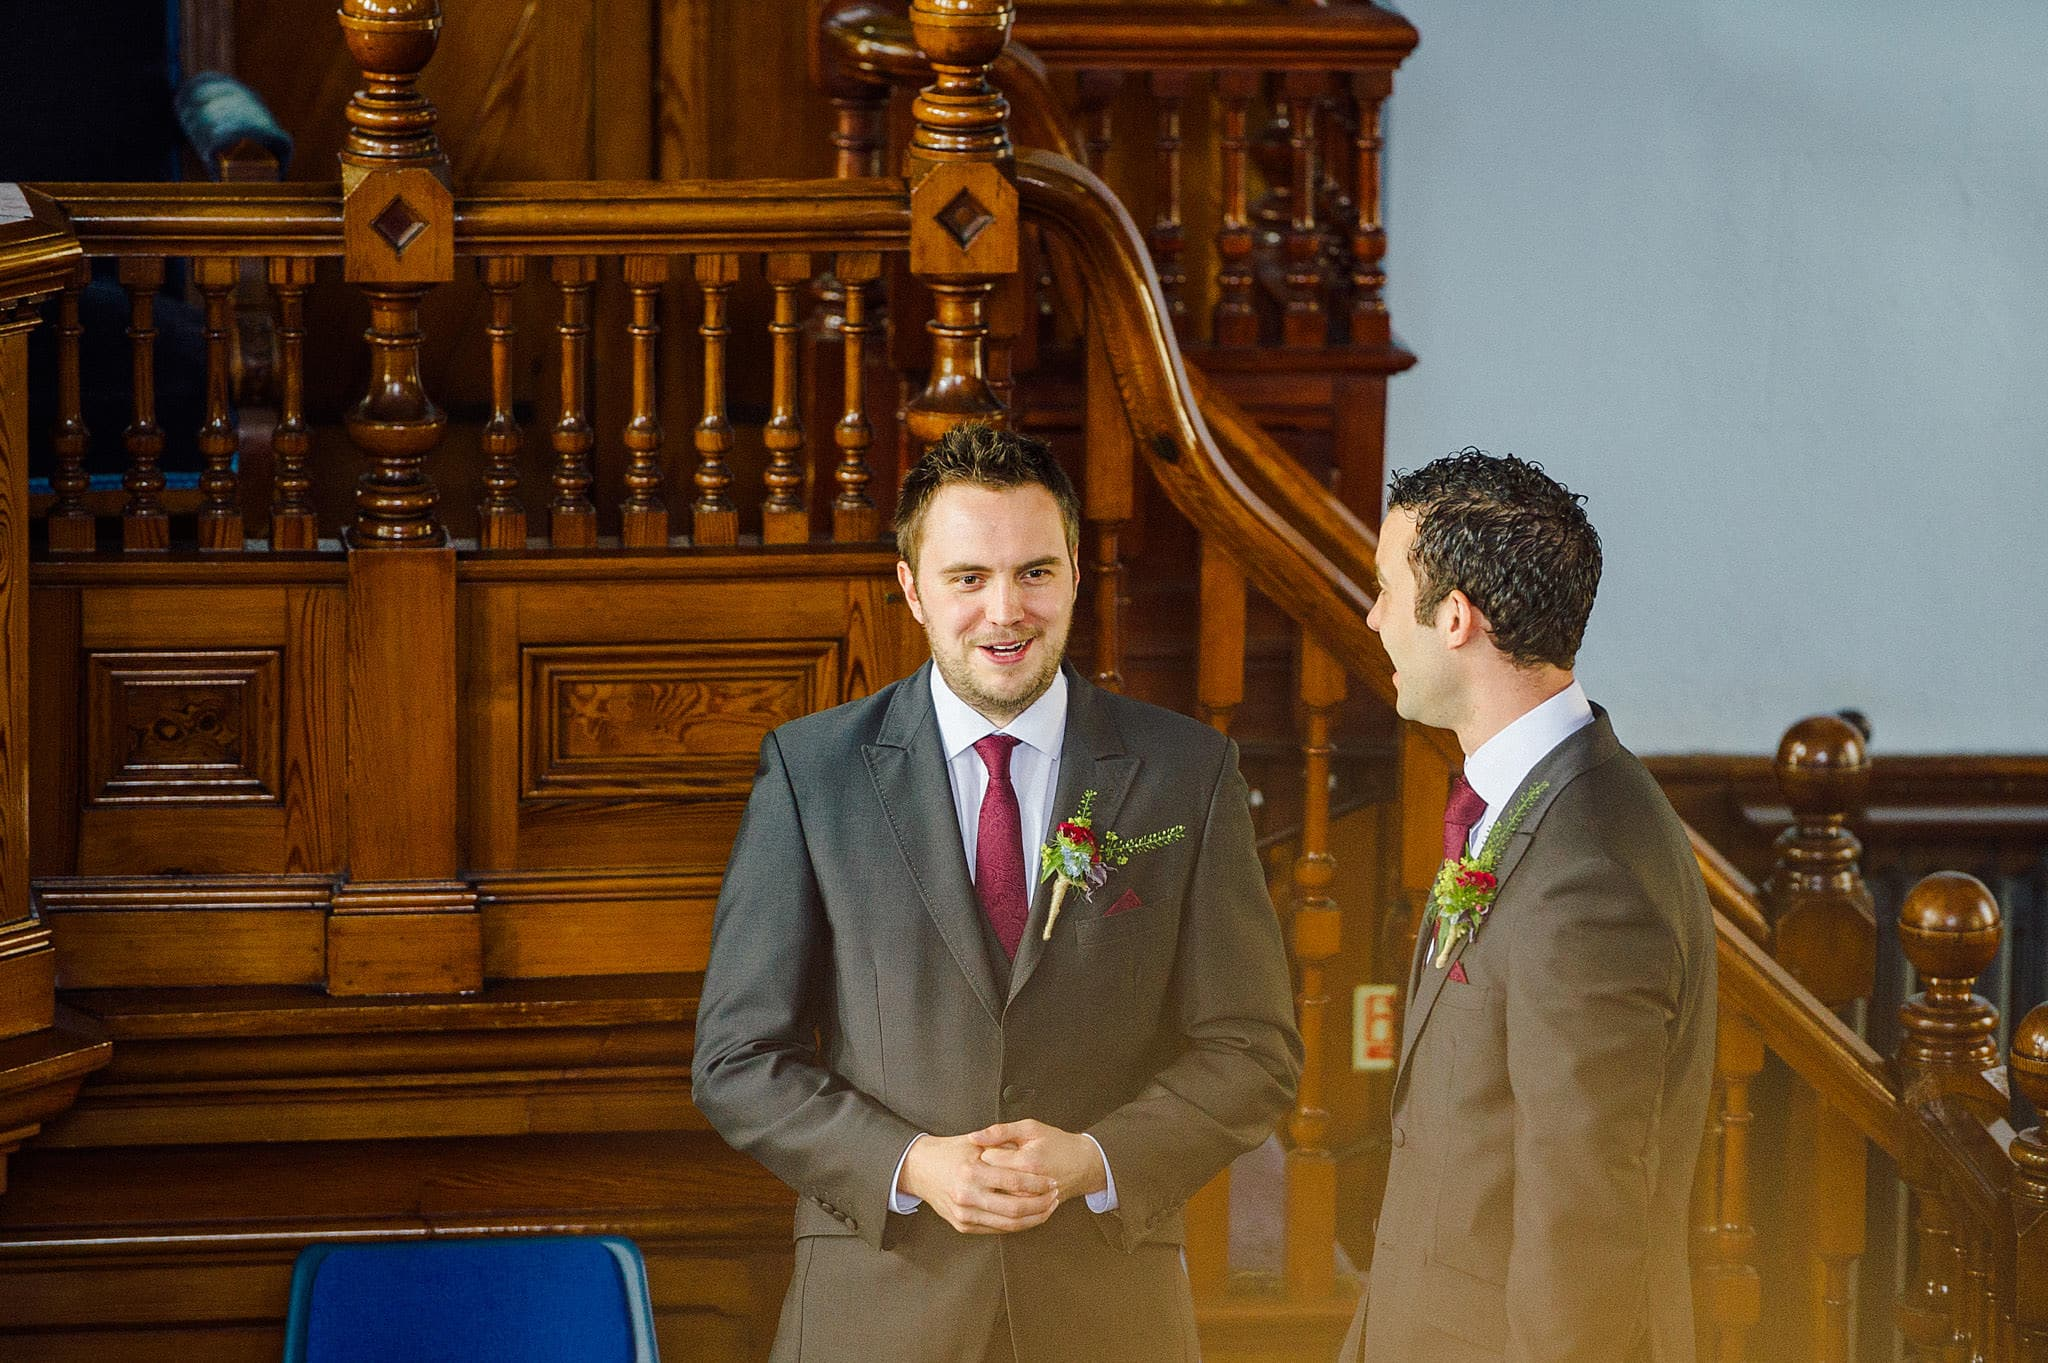 wedding-photographer-aberystwyth-wales (29)